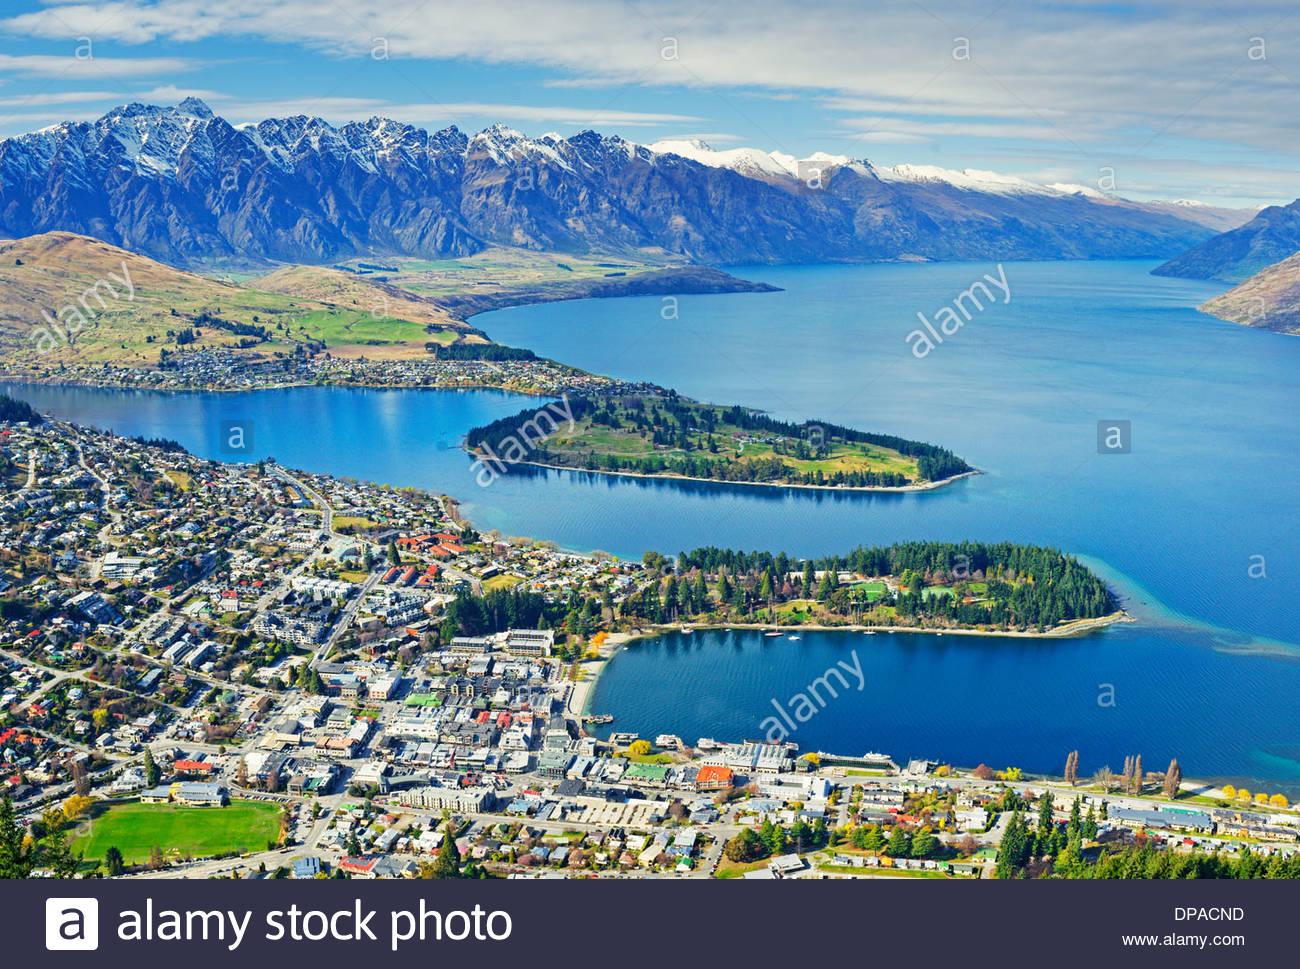 Queenstown and Lake Wakatipu, South Island, New Zealand - Stock Image